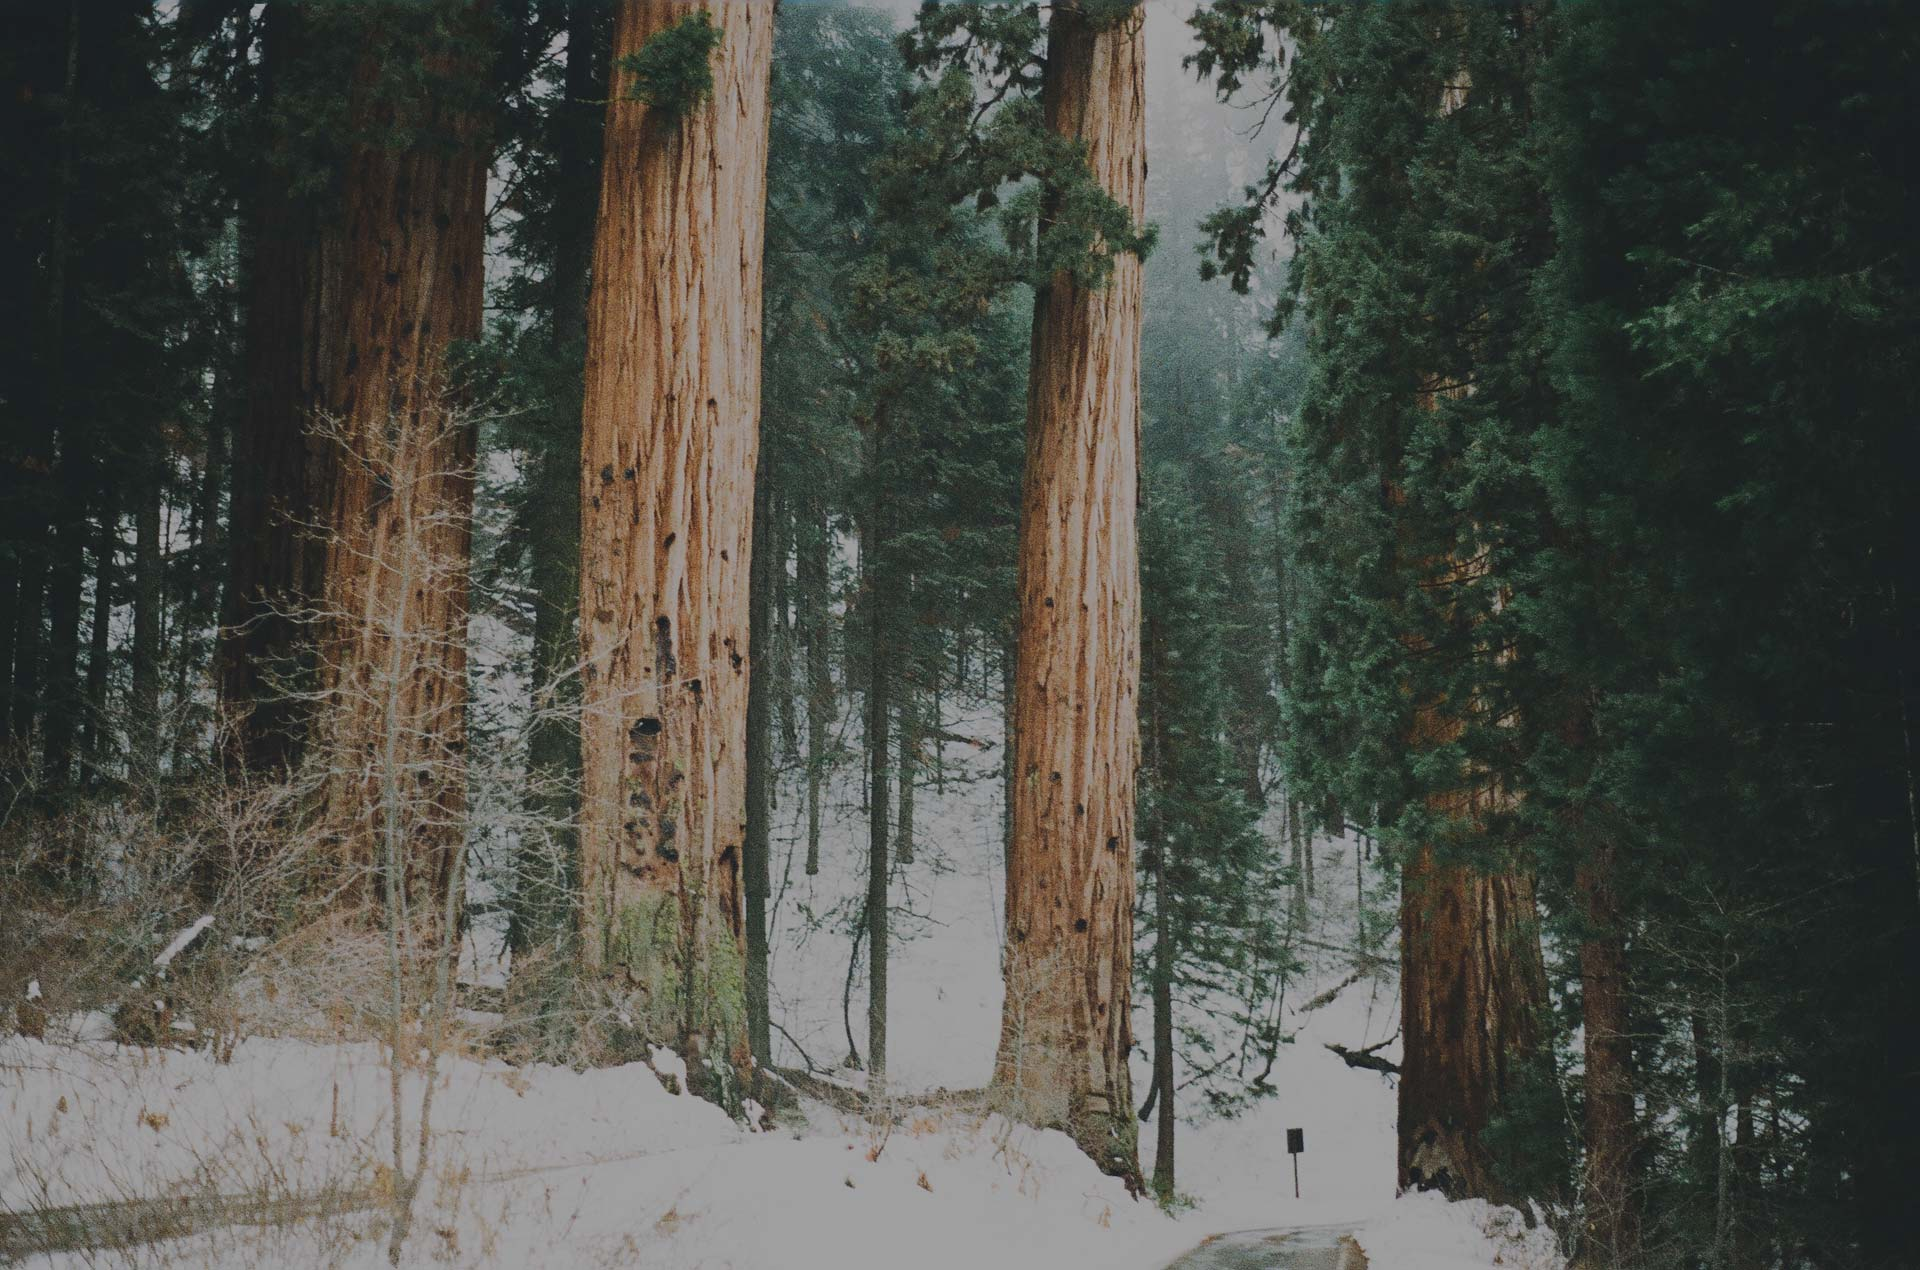 SequoiaBigs